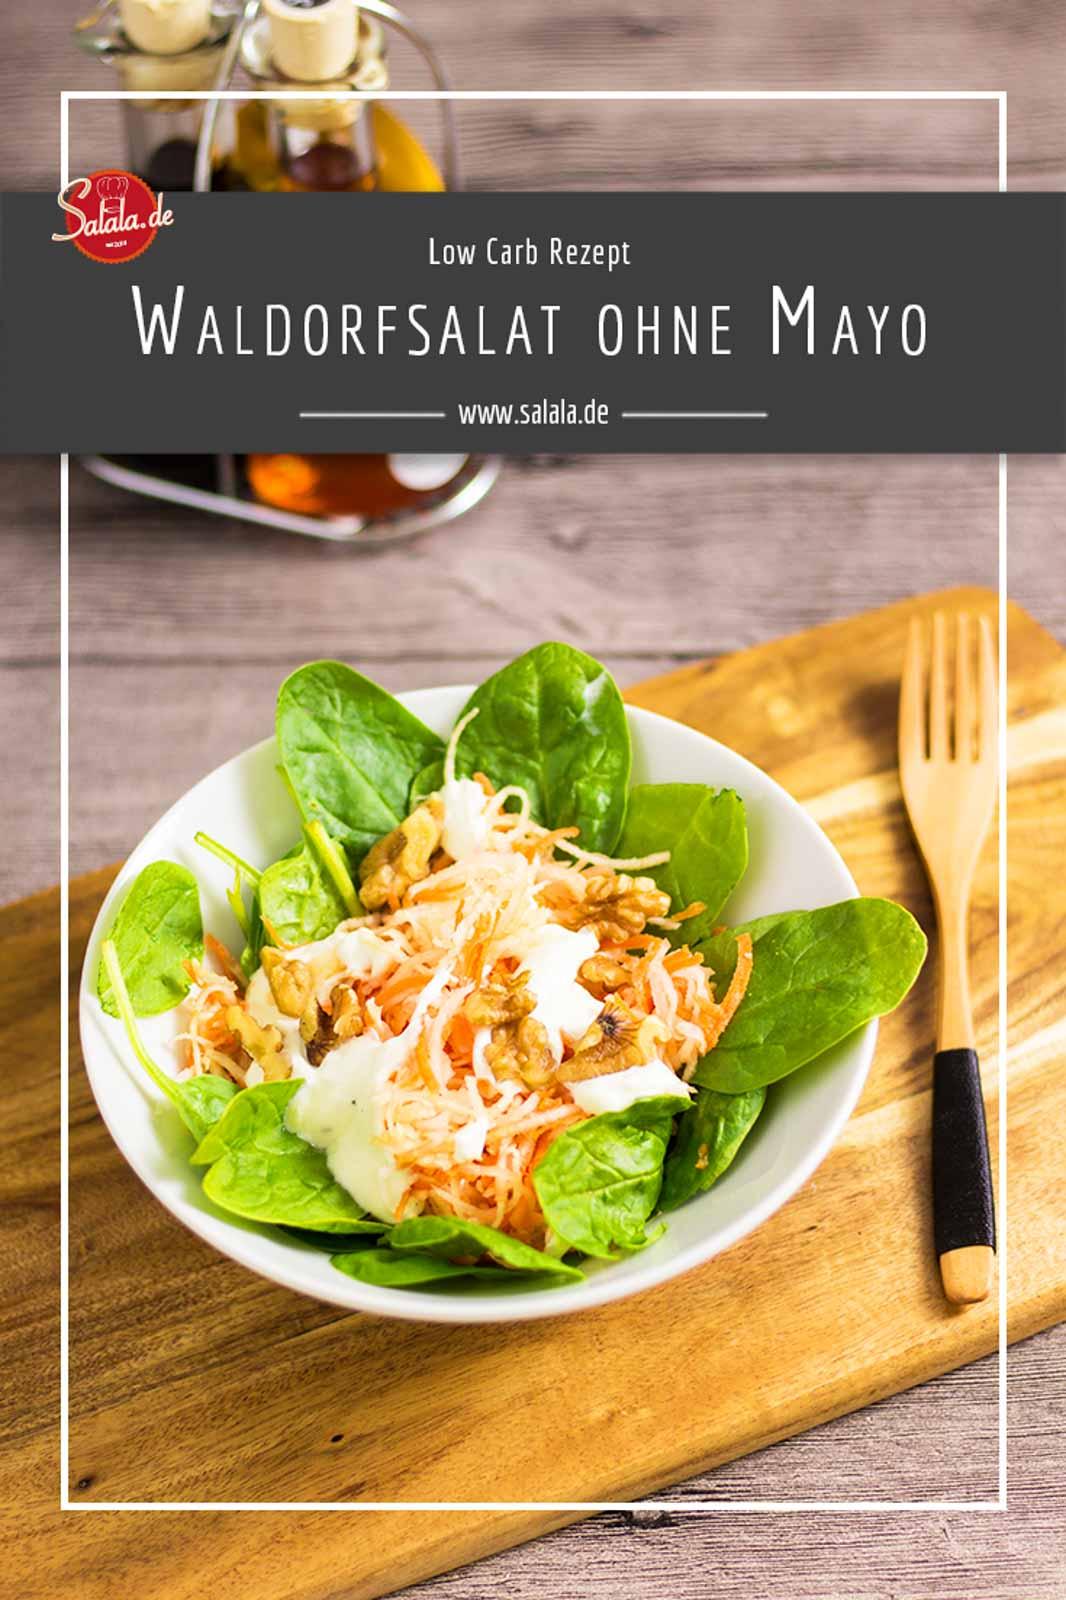 Low Carb Waldorfsalat - by salala.de - Rezept Low Carb selber machen ohne Mayonnaise mit Spinat #lowcarb #lowcarbsalat #lowcarbrezepte #salat #waldorfsalat